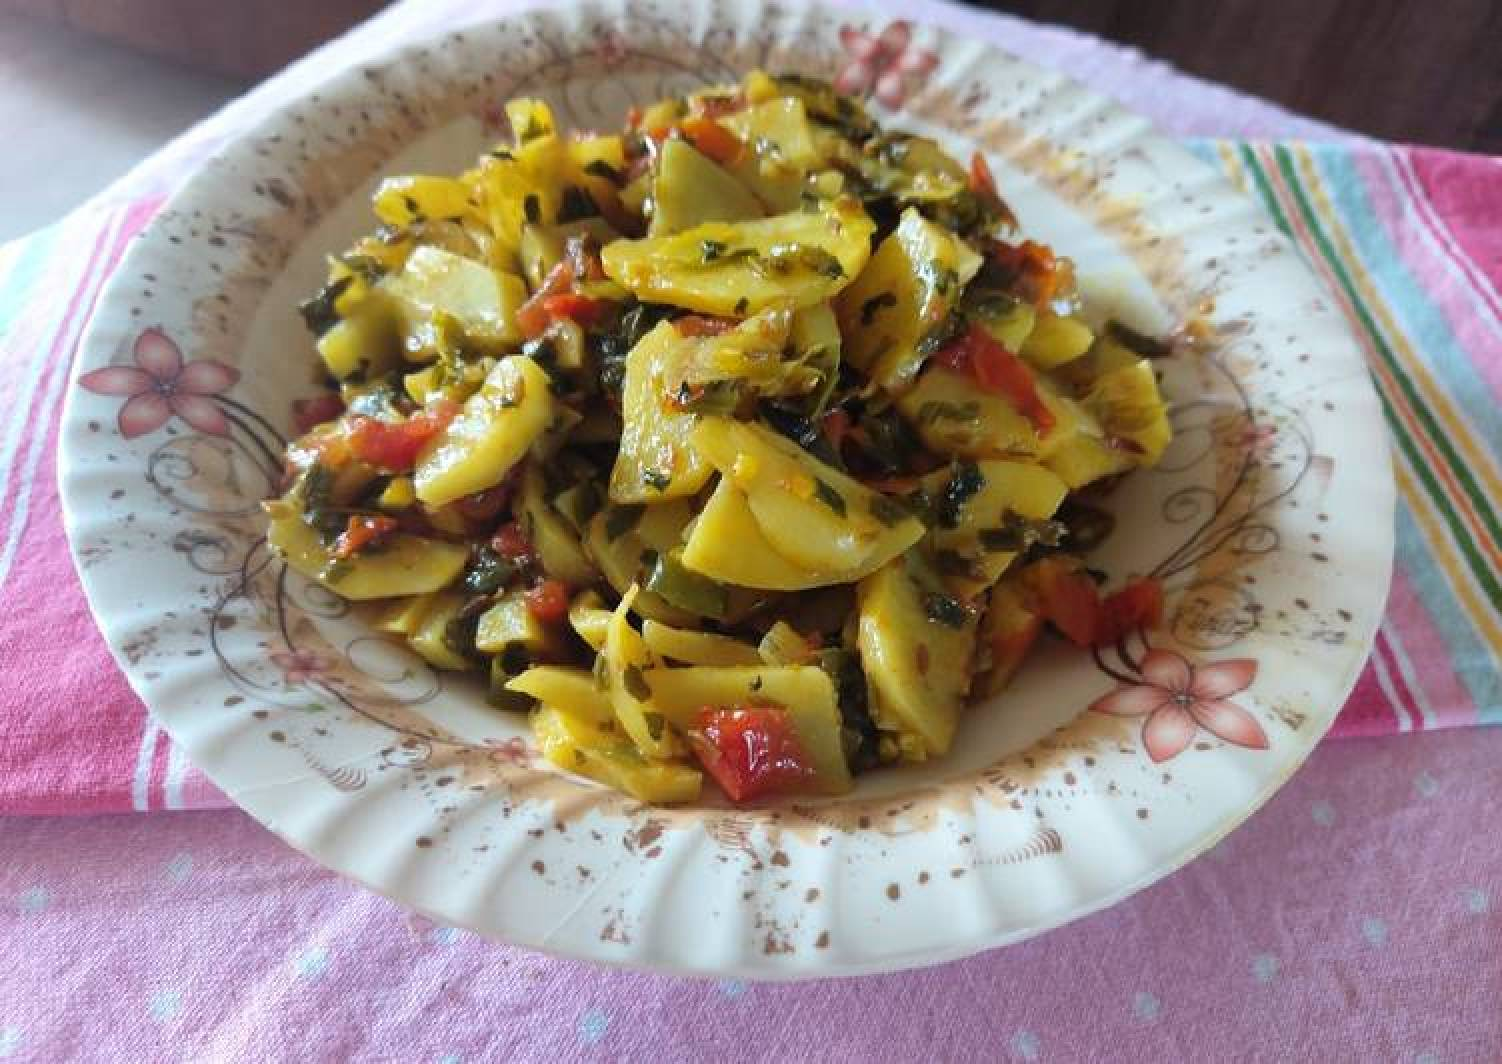 Potato with spring onion fenugreek leaves